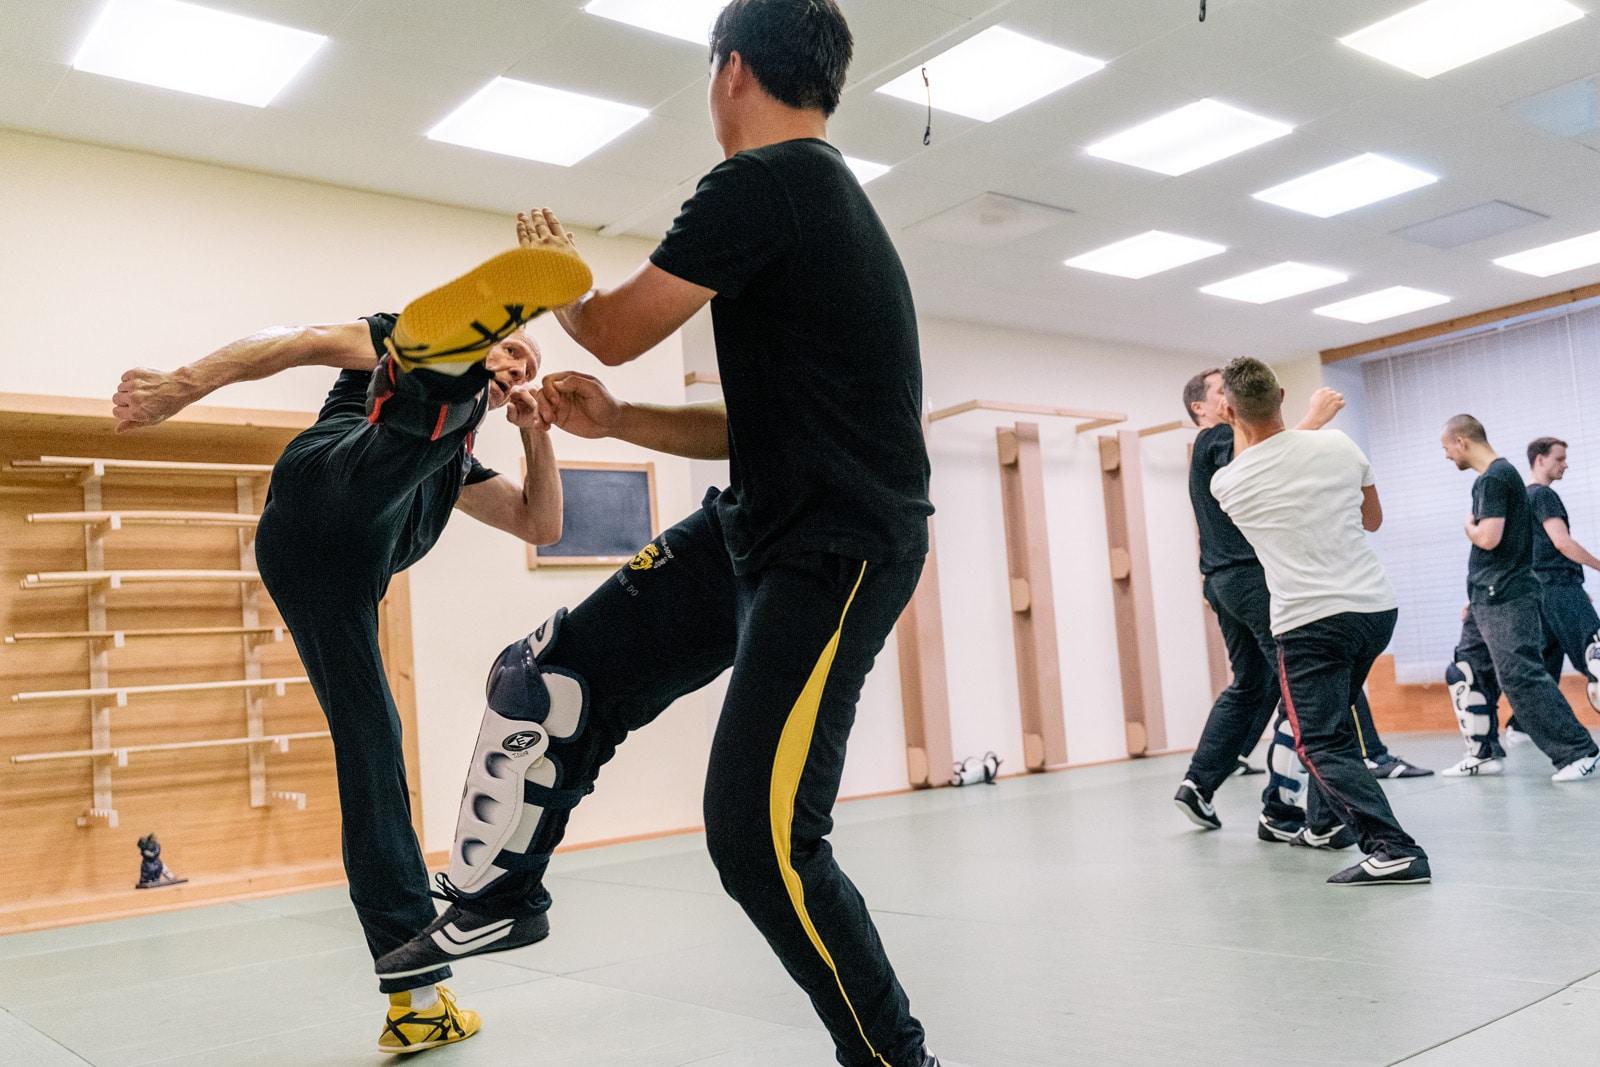 Kampfkunst Oder Kampfsport?